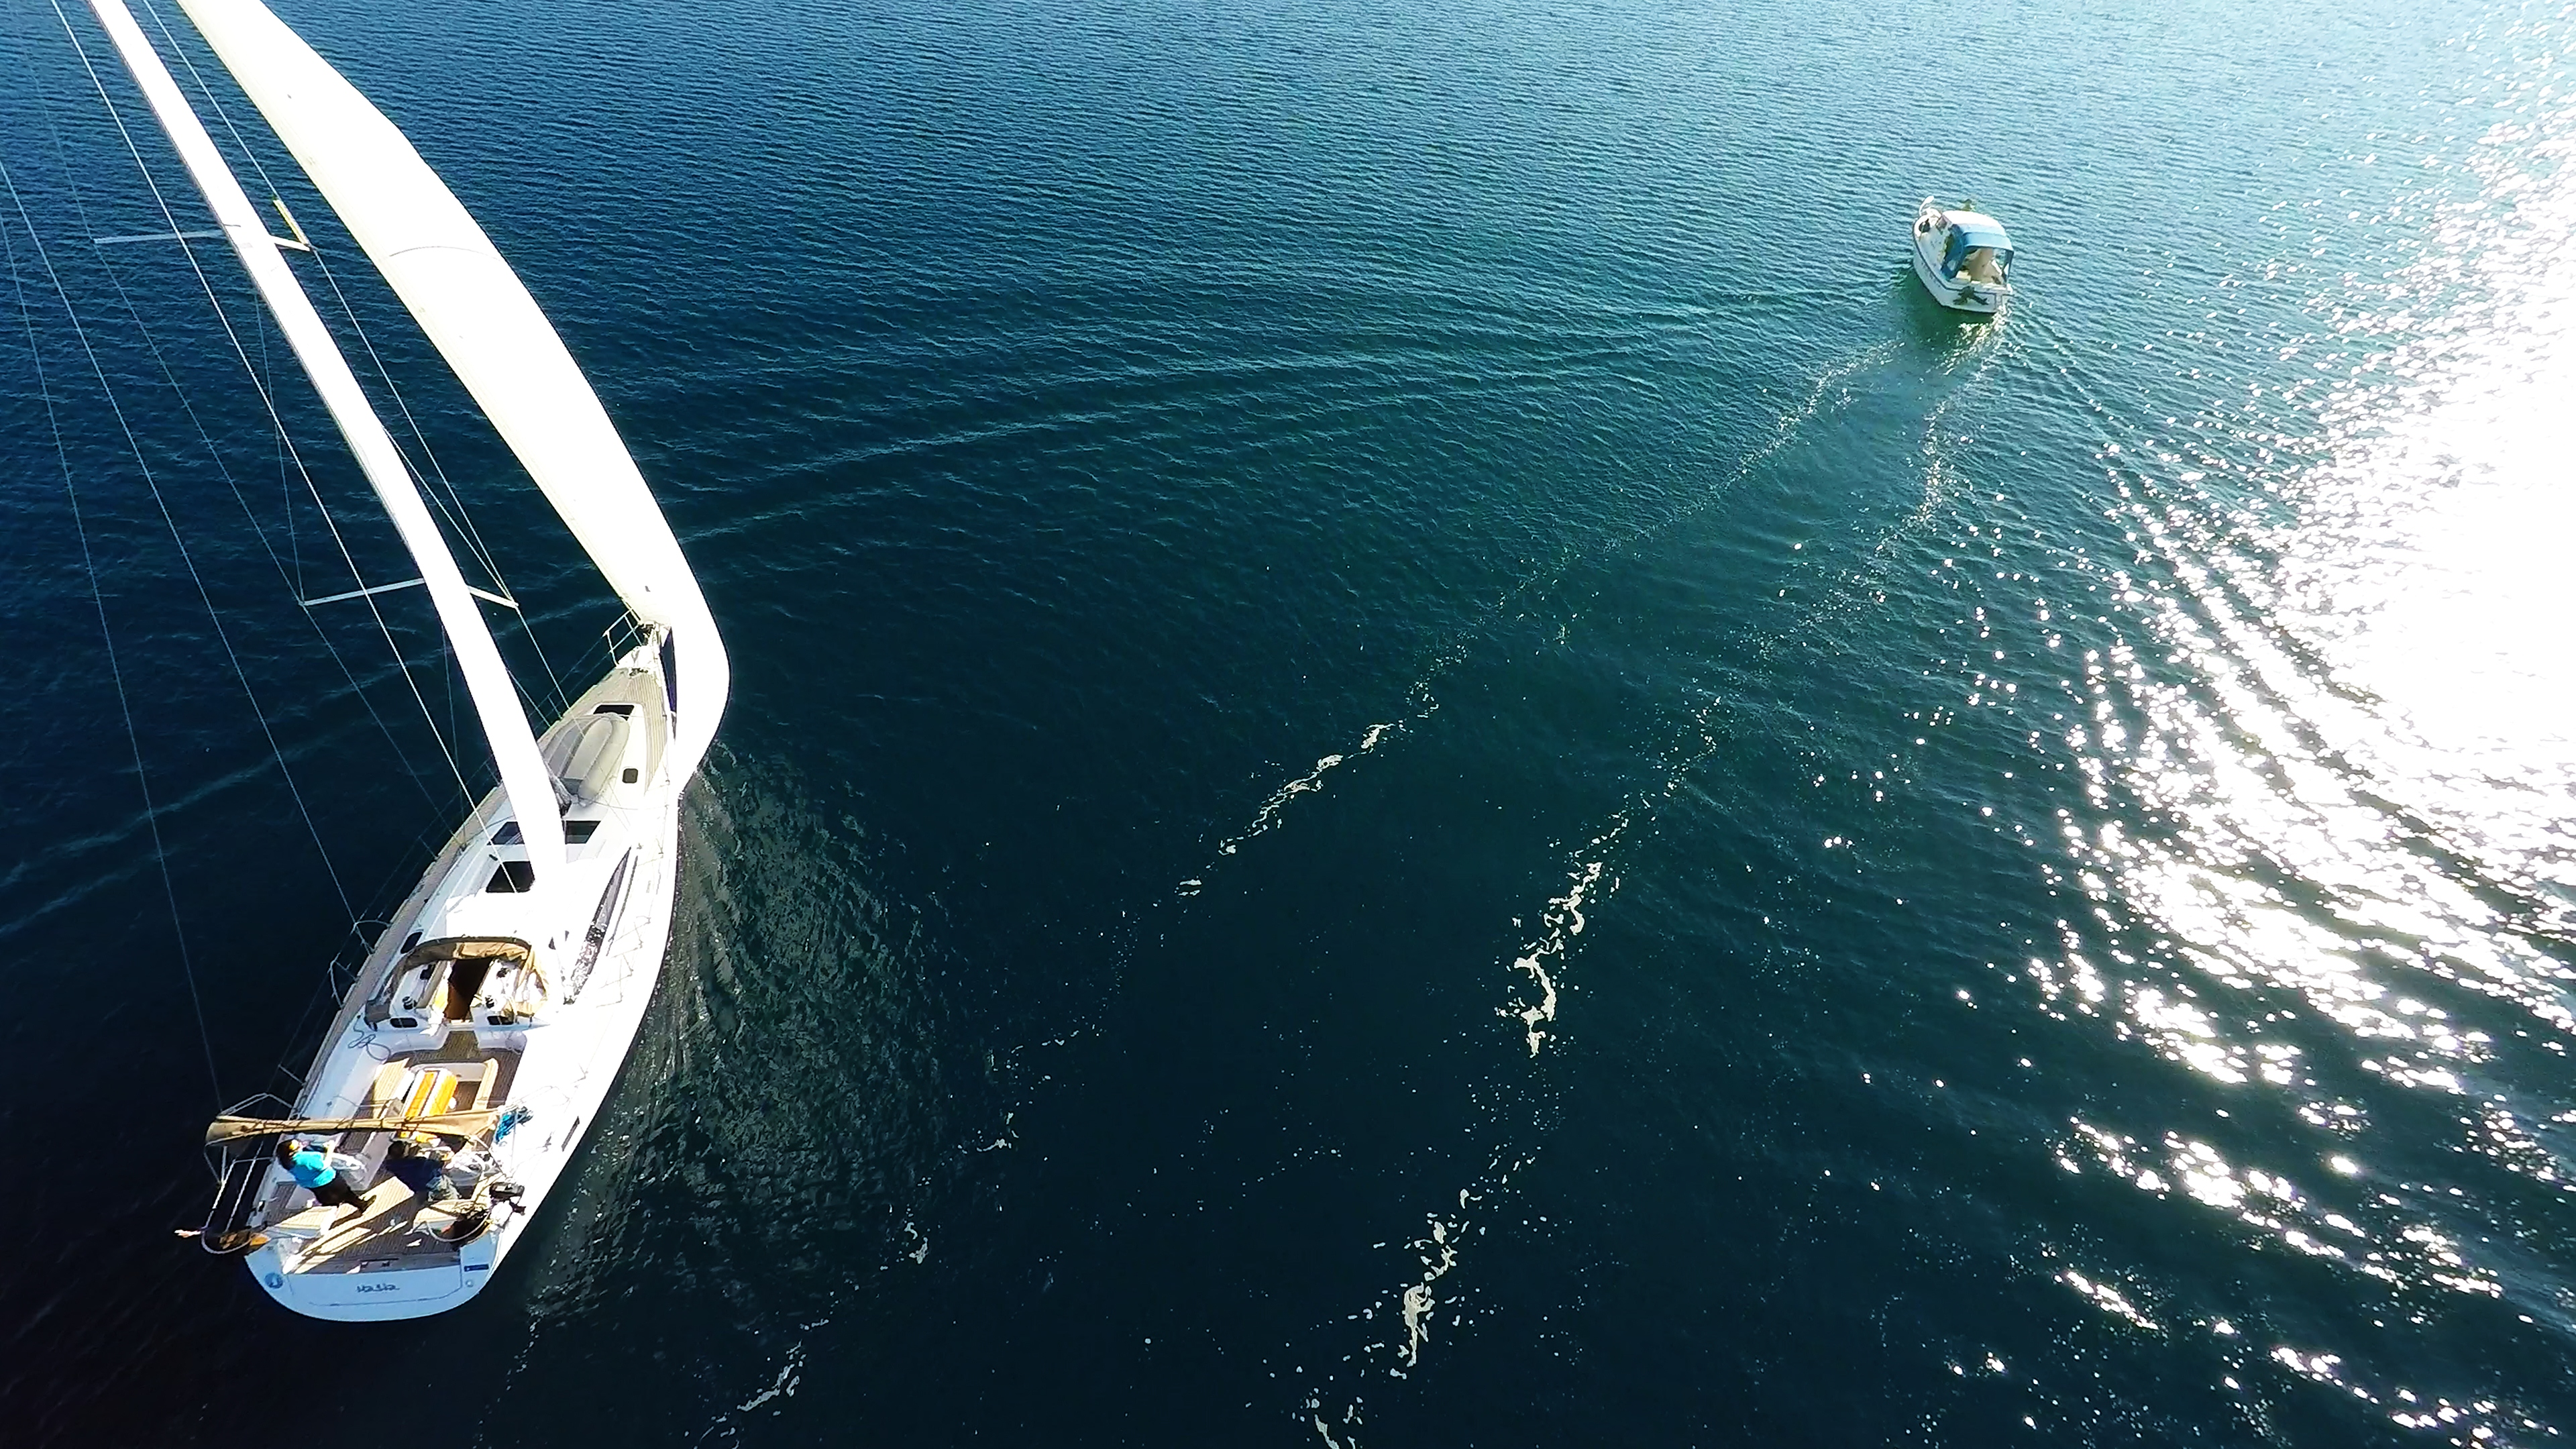 barcha a vela yacht a velae barca a motoreeal mare blu sole